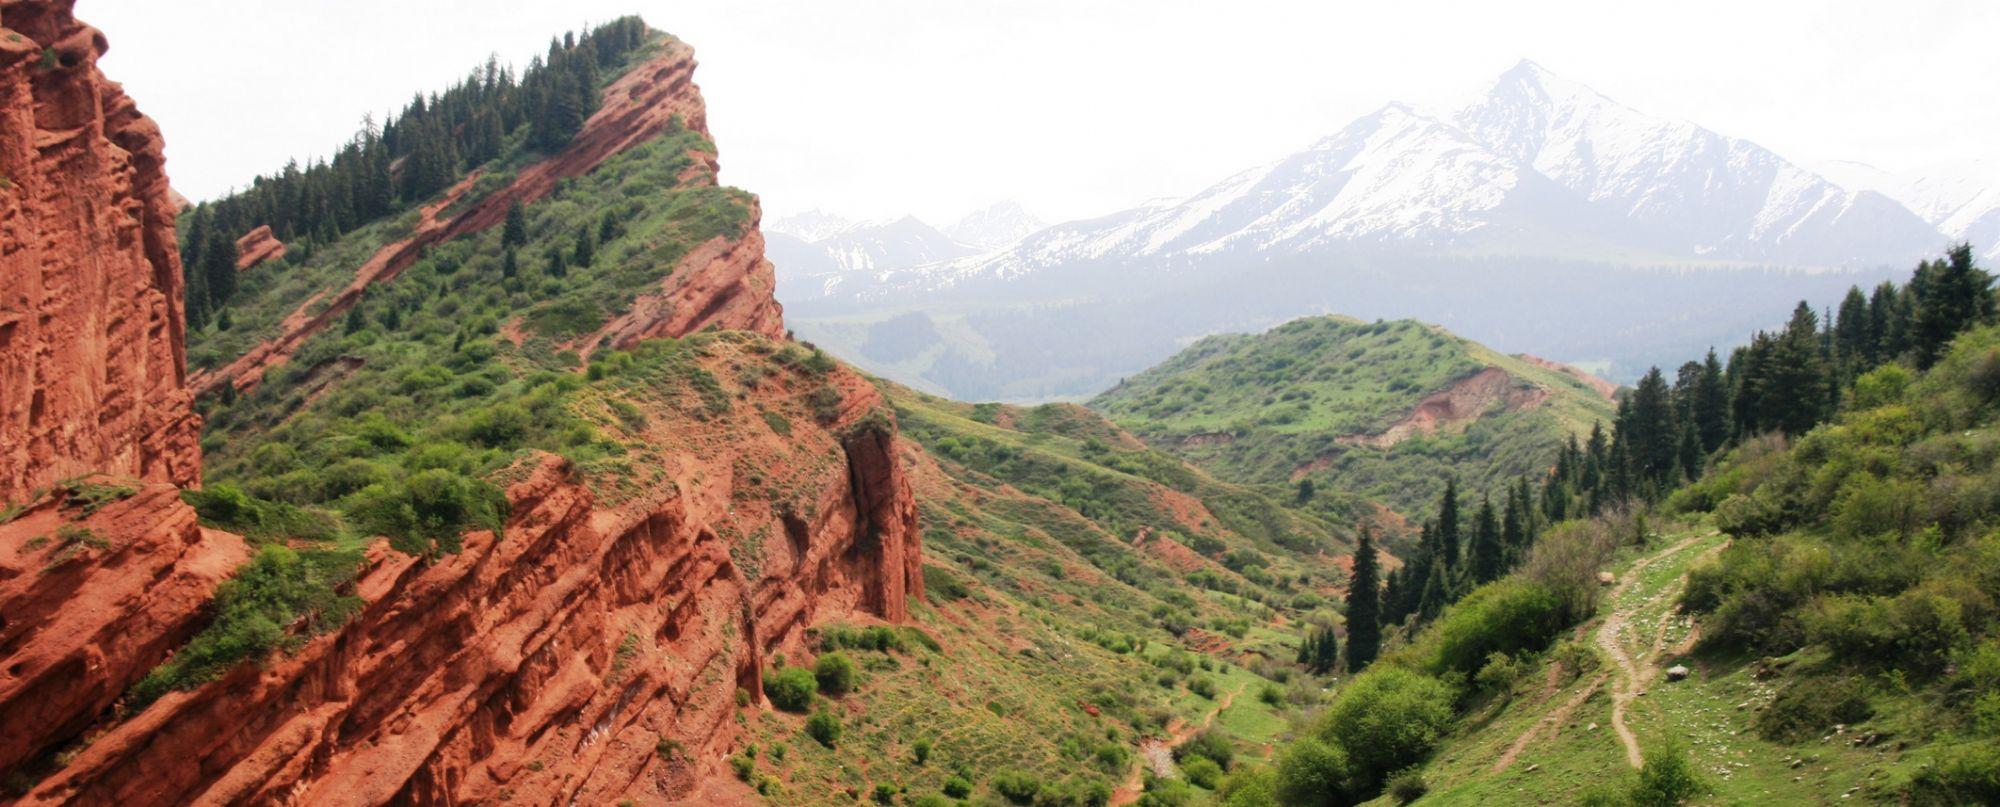 Kyrgyzstán -  Cruzando las tierras altas de Kyrgyzstán - Especial Semana Santa